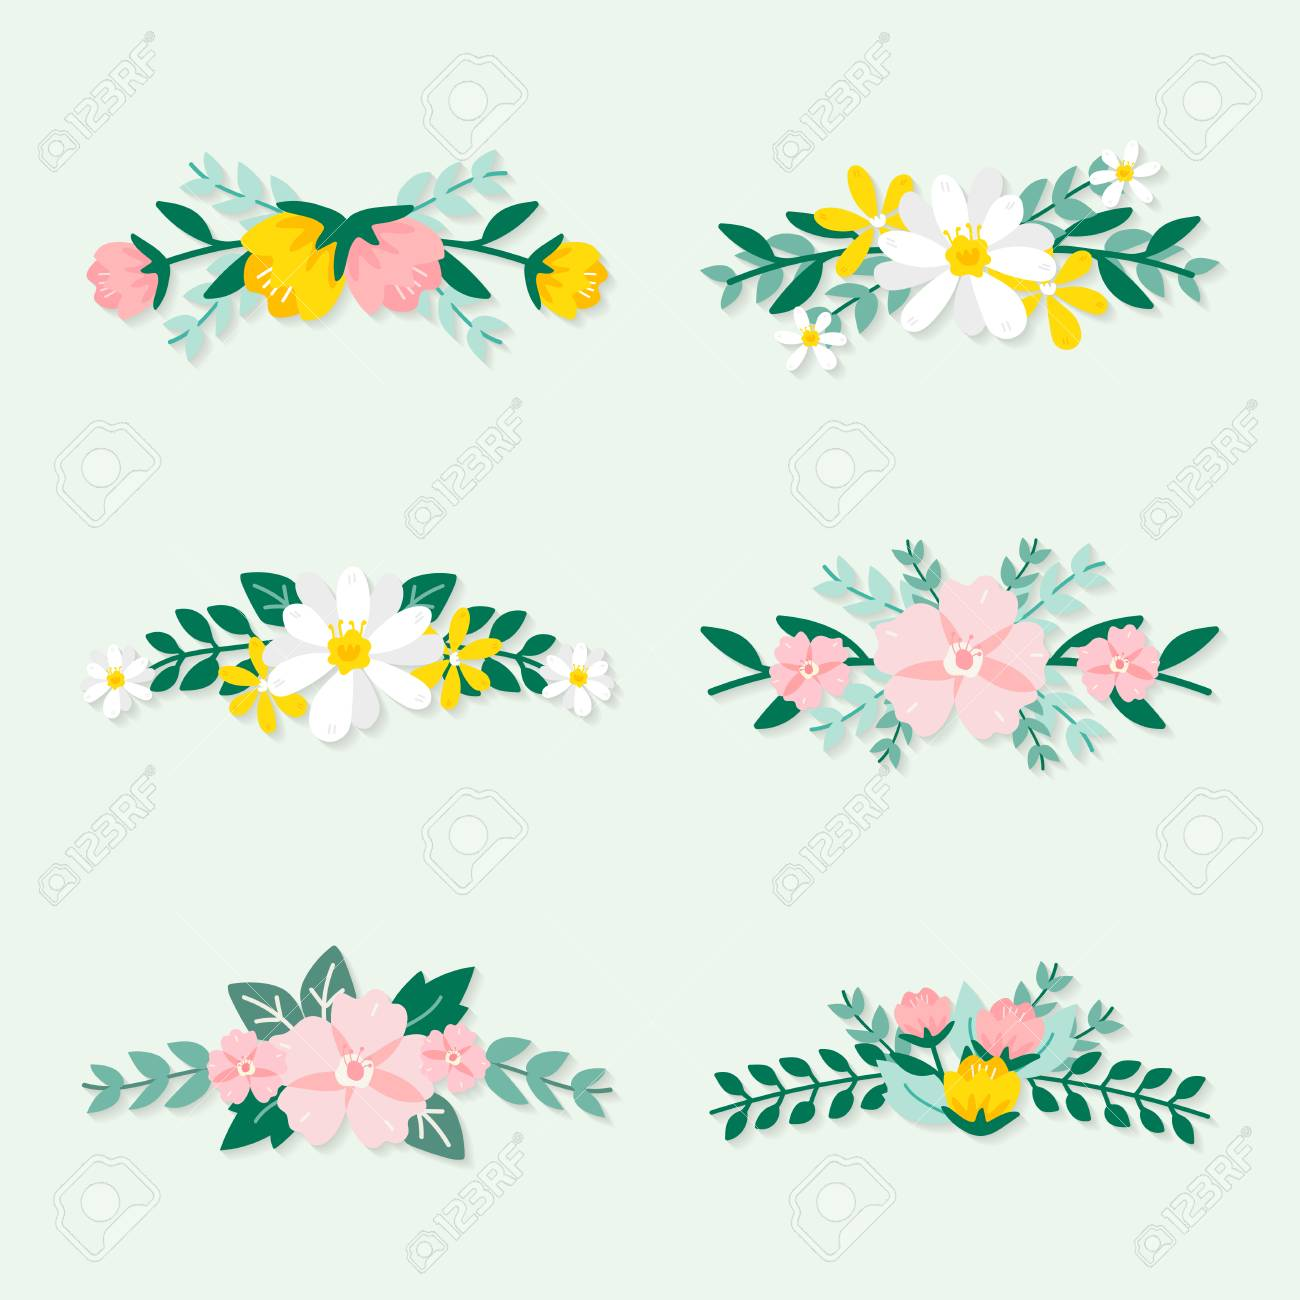 Colorful spring floral ornate vectors - 125376306